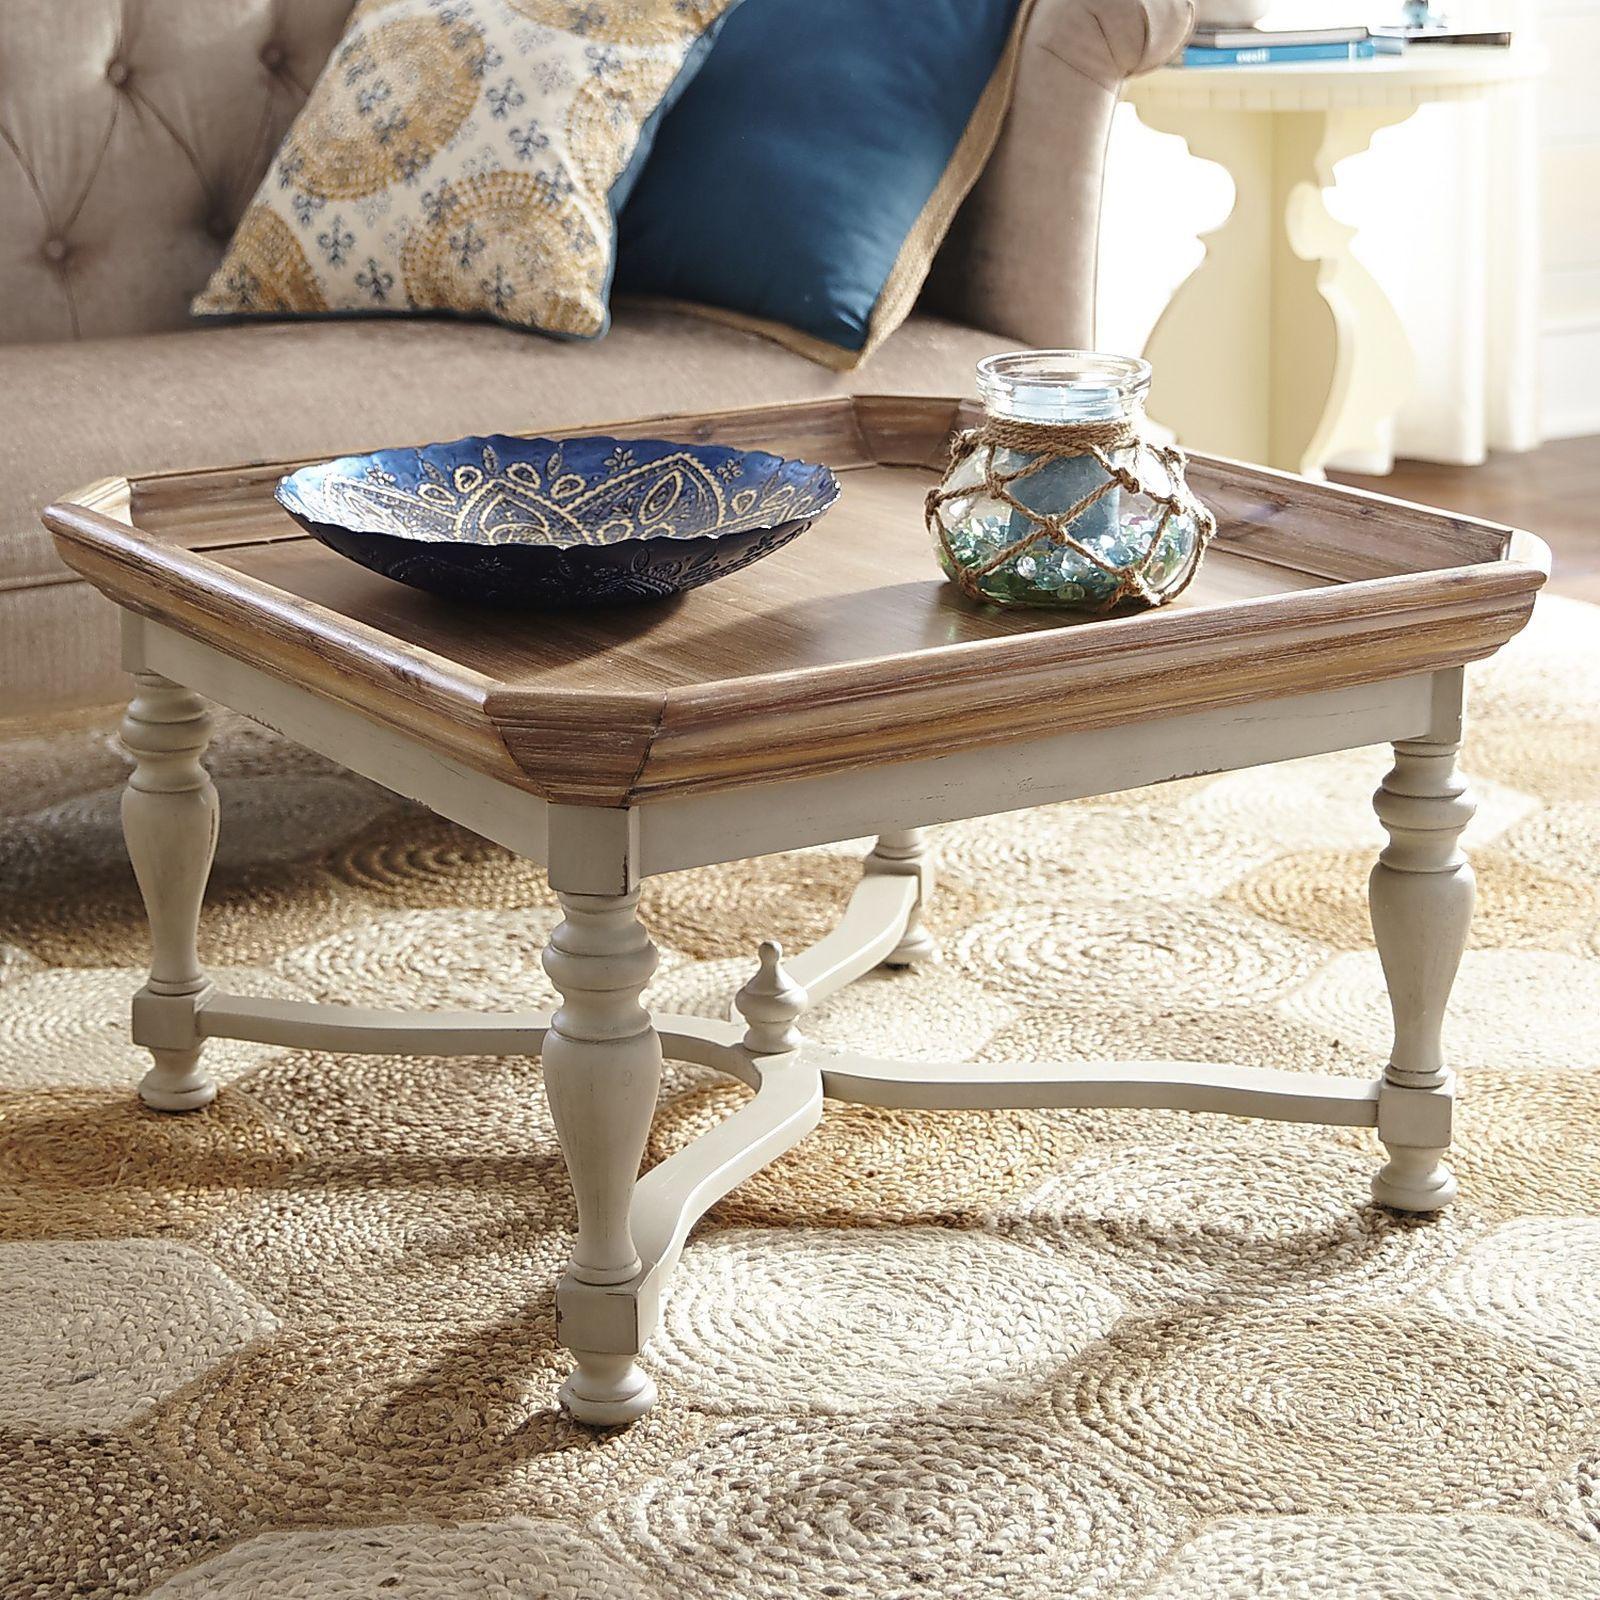 Amelia Natural Stonewash Square Coffee Table Home Decor Traditional Interior Decor